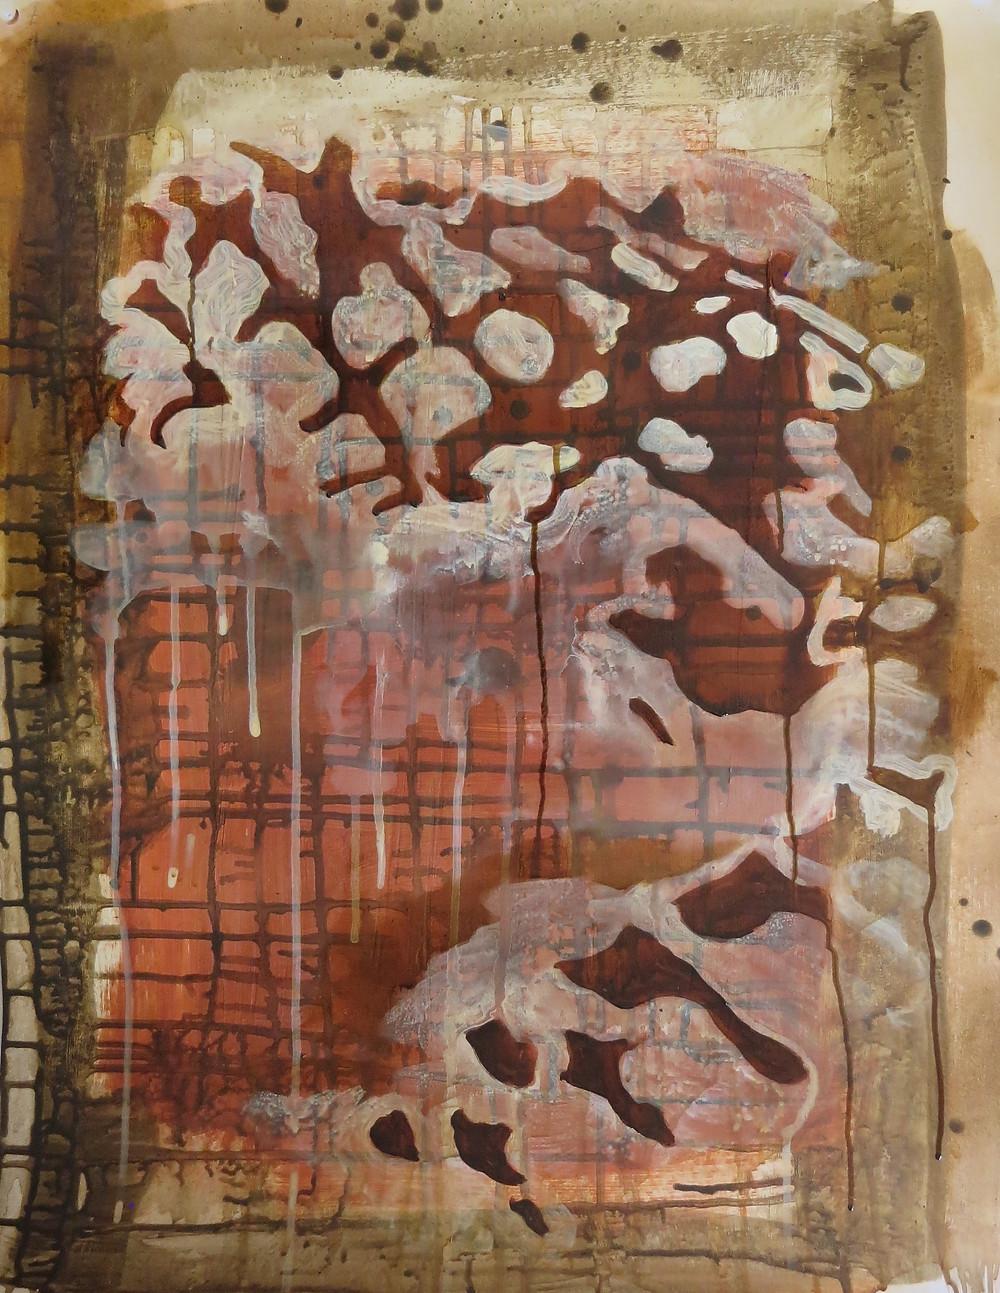 KONSTRUKTION No. 20 Terra Cotta